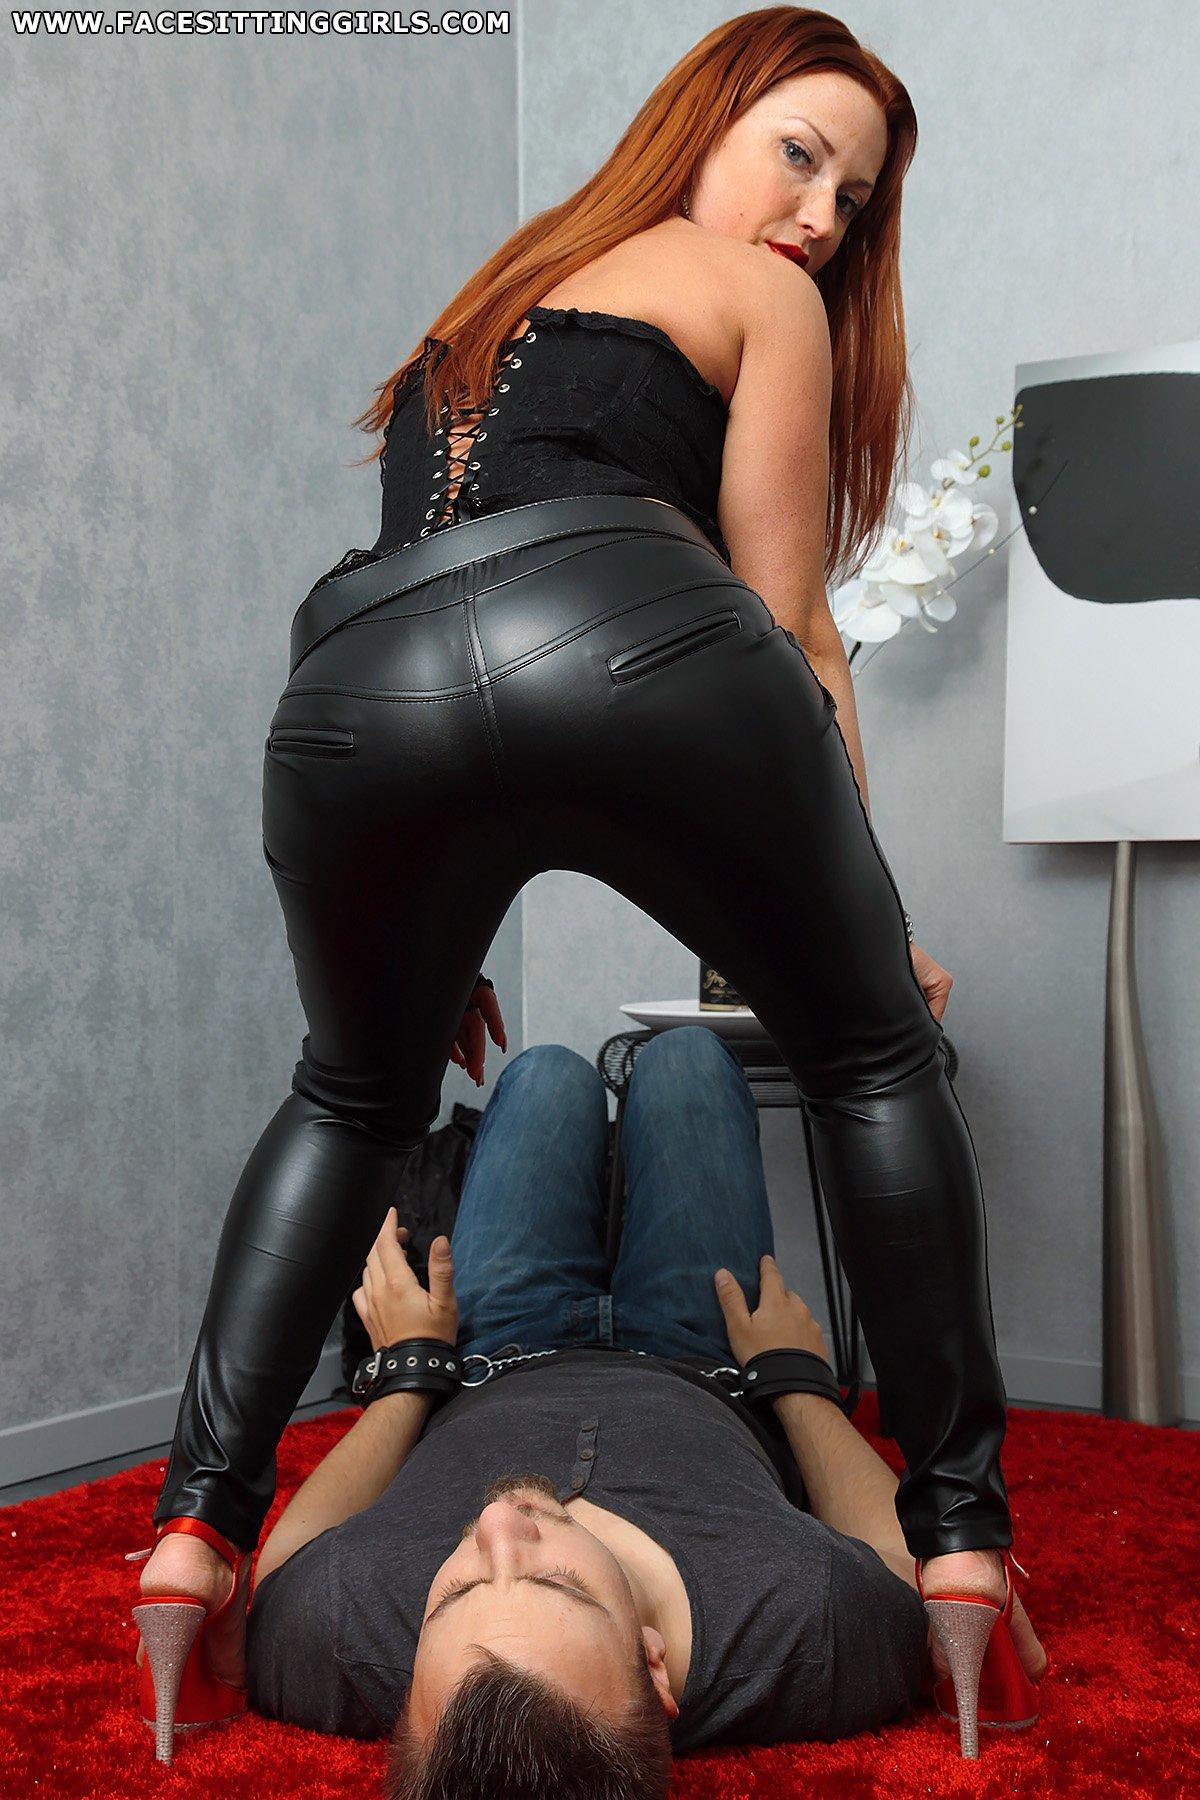 from Dayton women in leather pants xxx